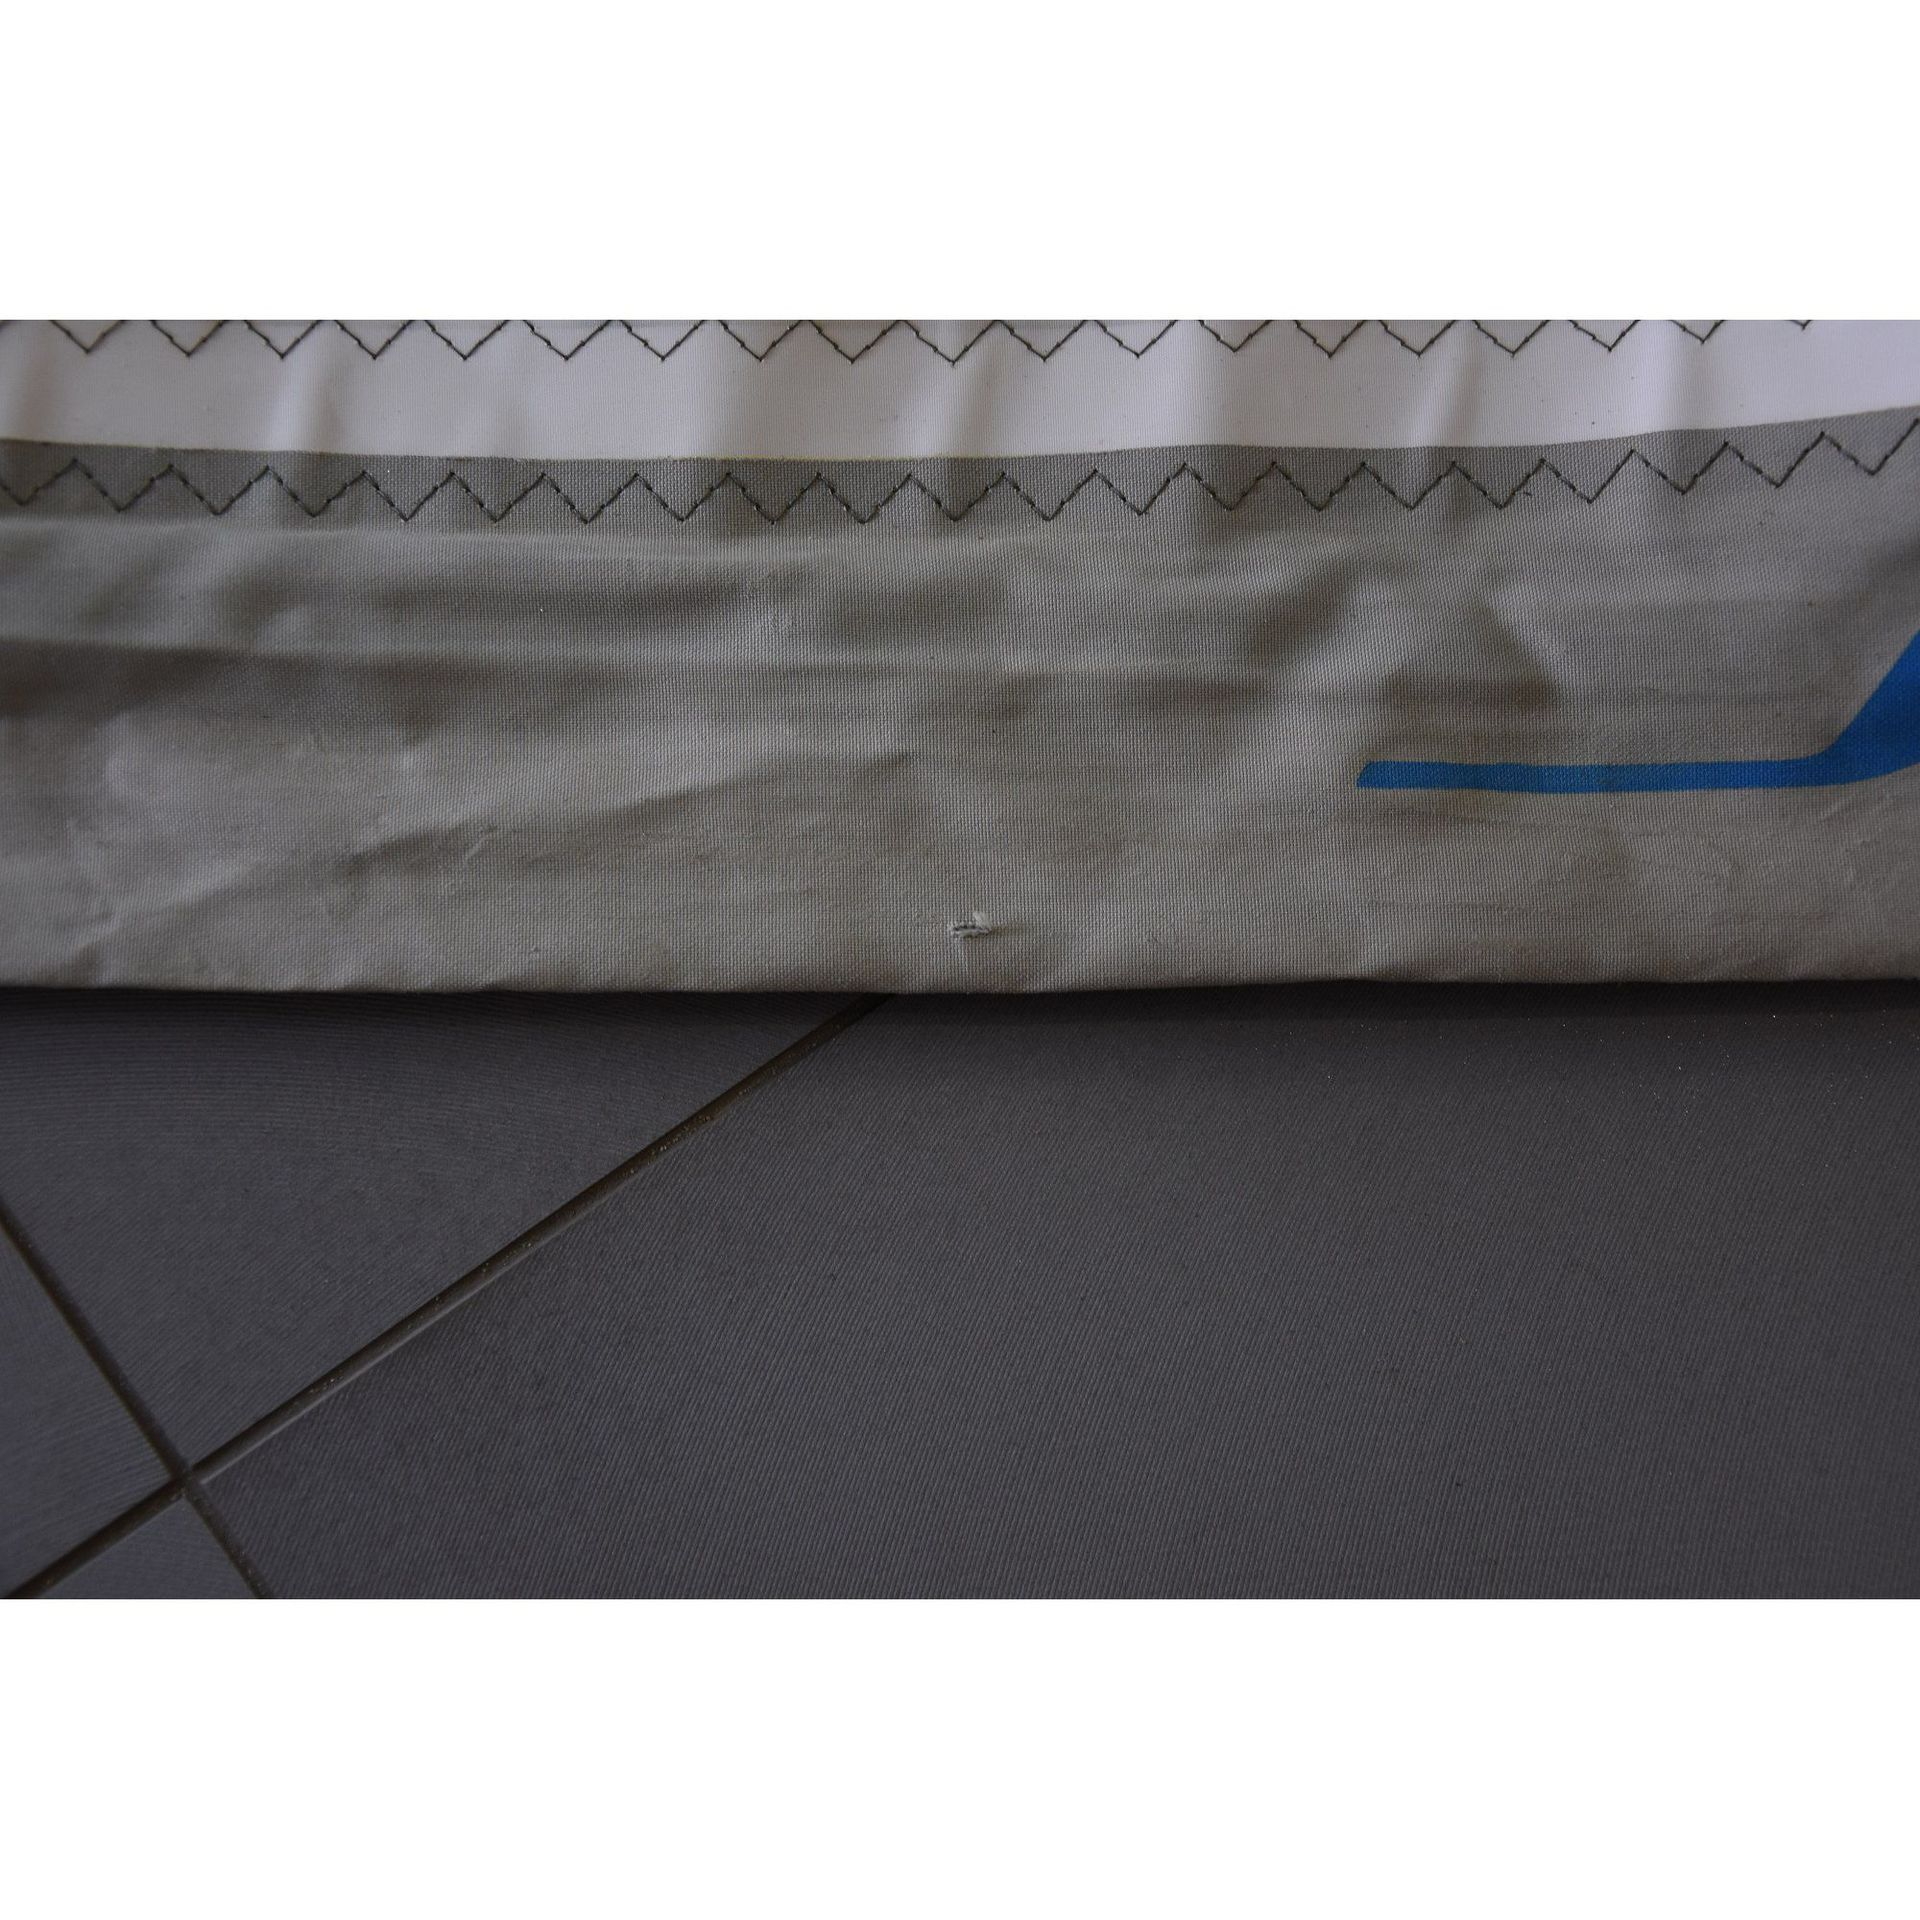 ŻAGIEL NORTH SAILS CURVE 2012 4.7 - FREERIDE  (471253) 5